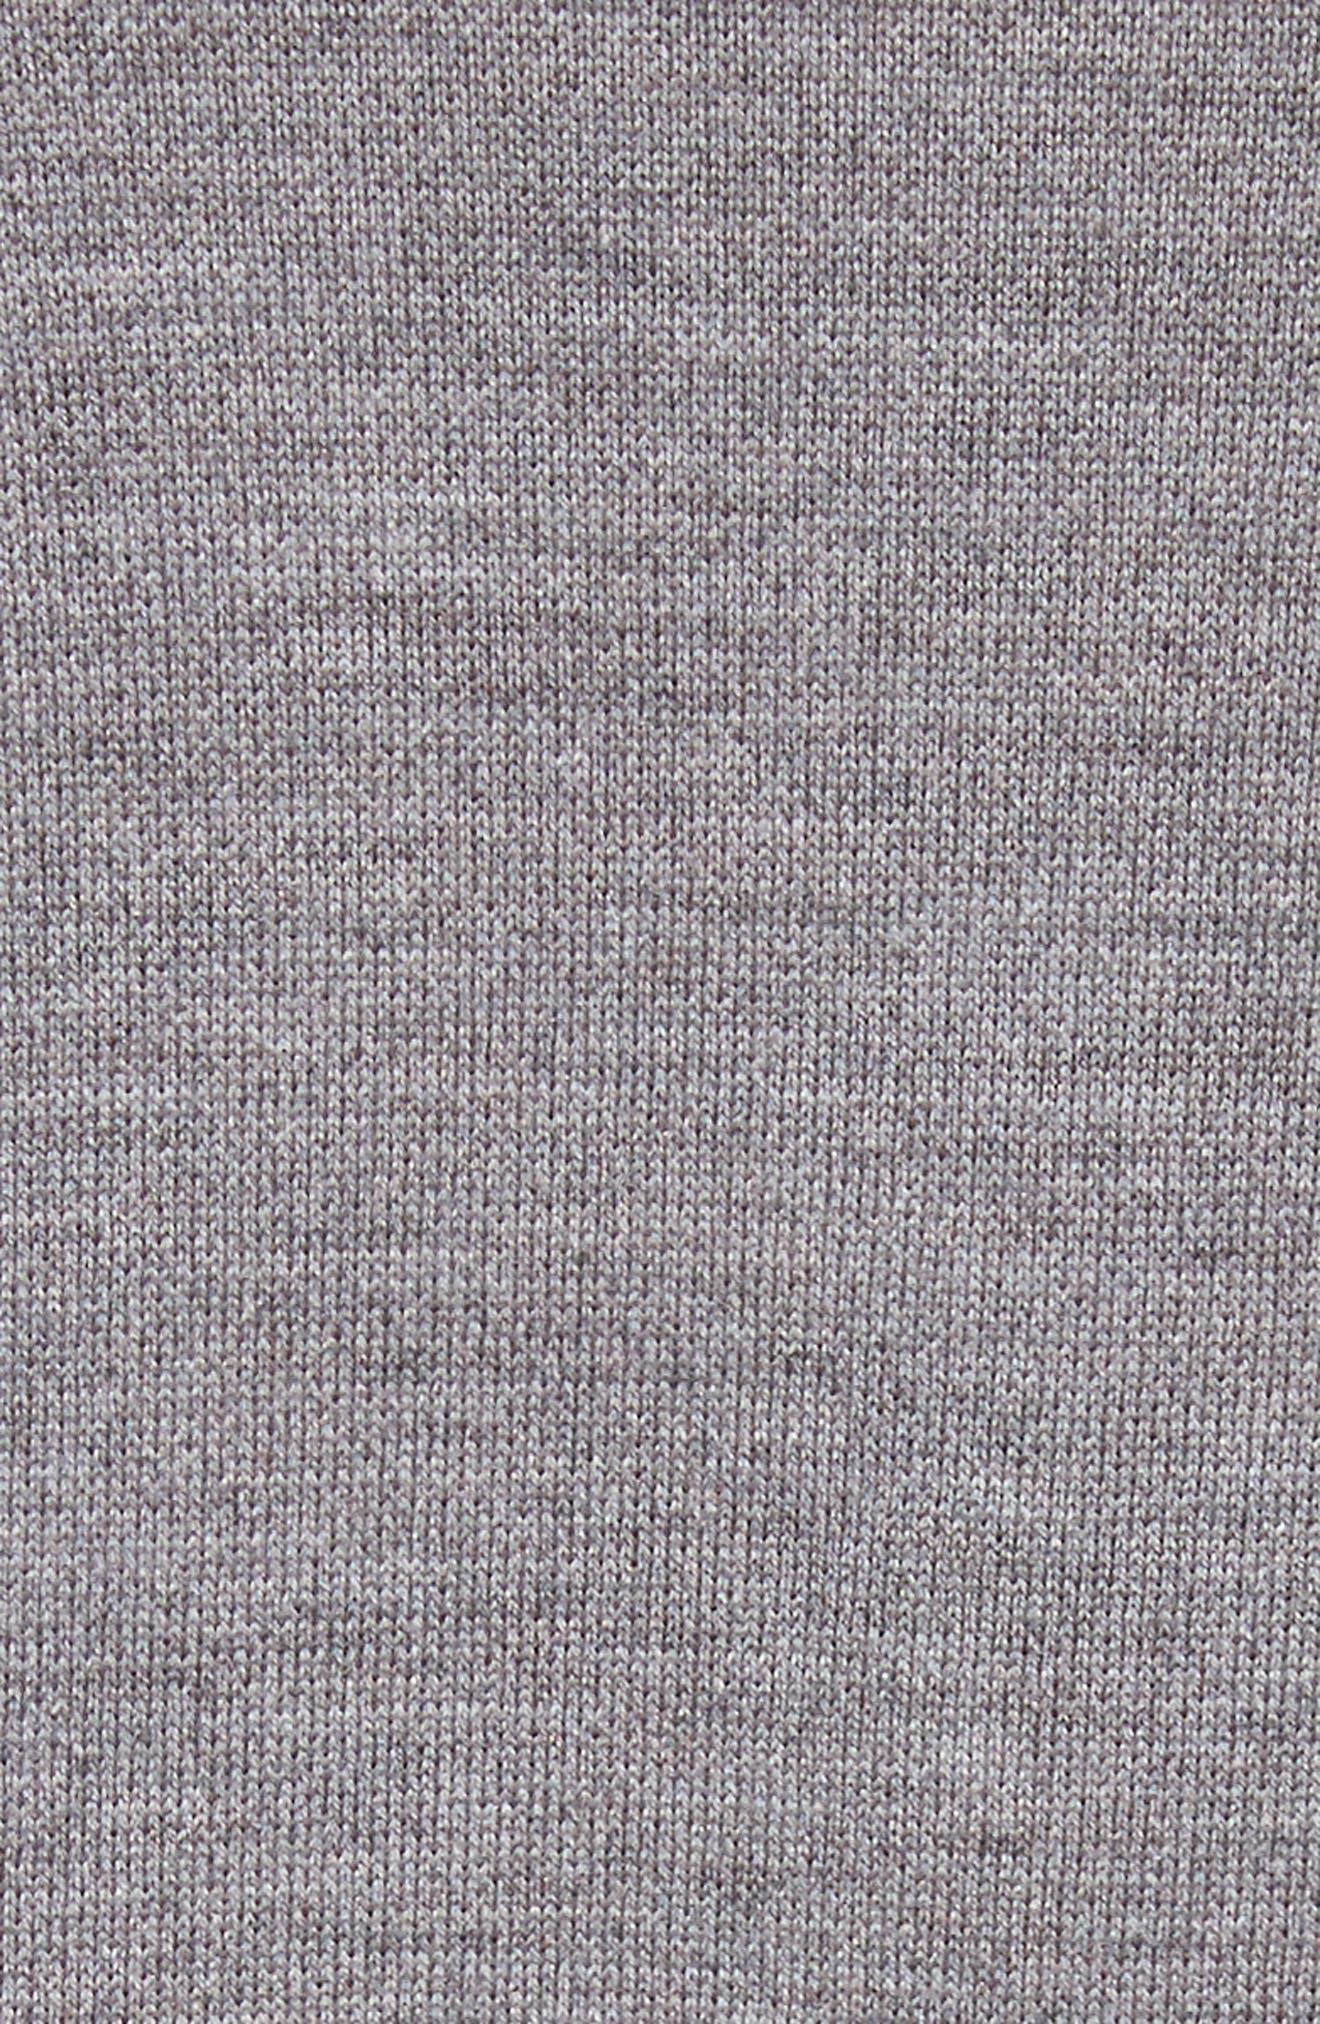 Alternate Image 5  - rag & bone Saralyn Merino Wool Blend Sweater Dress